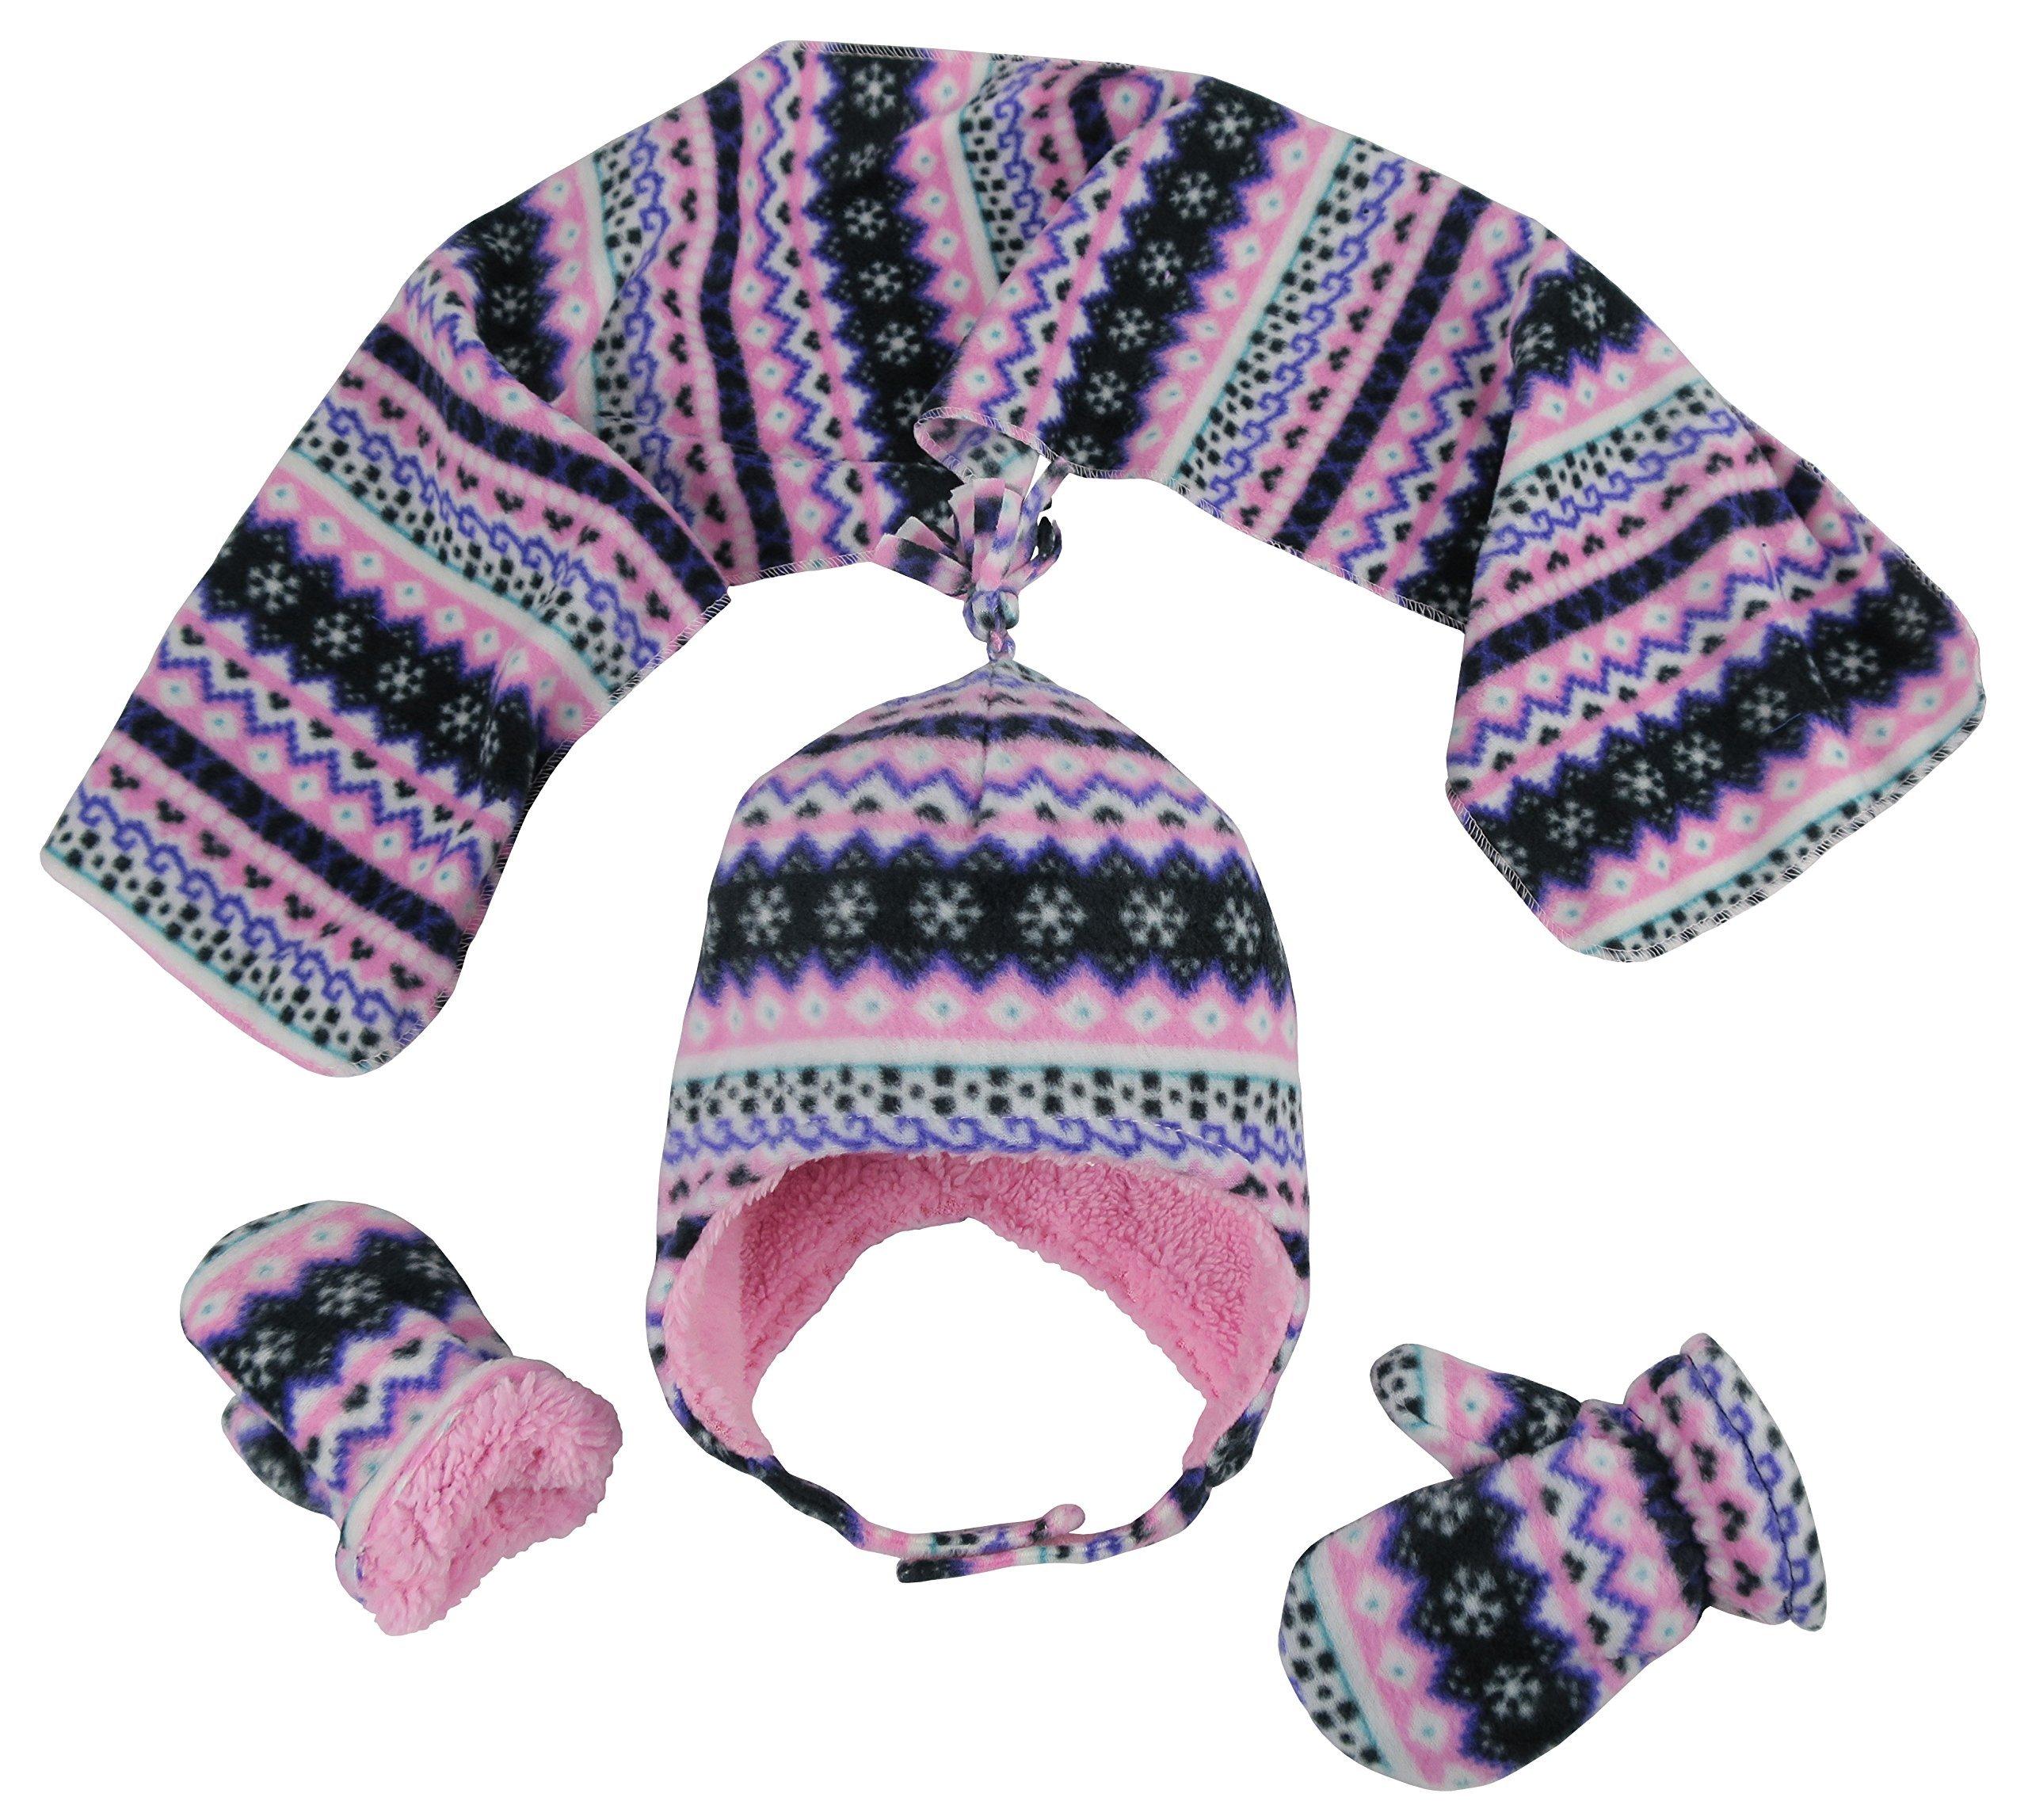 NIce Caps Big Girls 7-10 Years Fair Isle Print Hat and Gloves Accessory Set